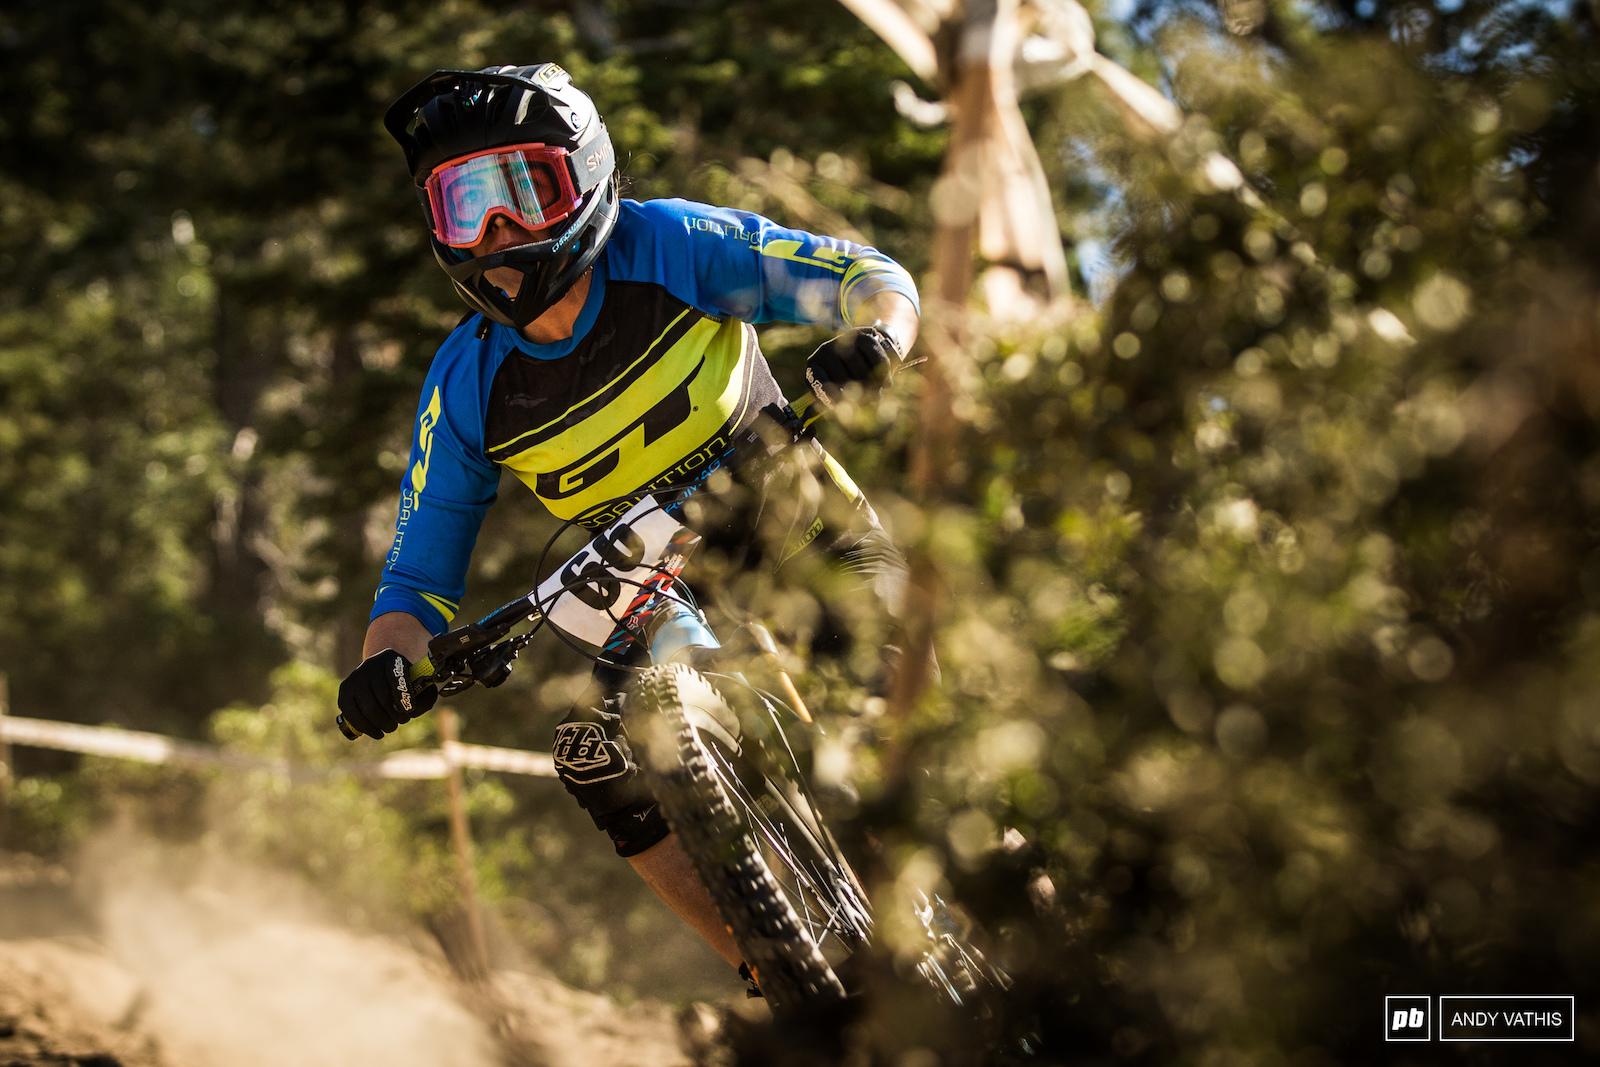 No fear enduro bike for Jennifer Mchugh.